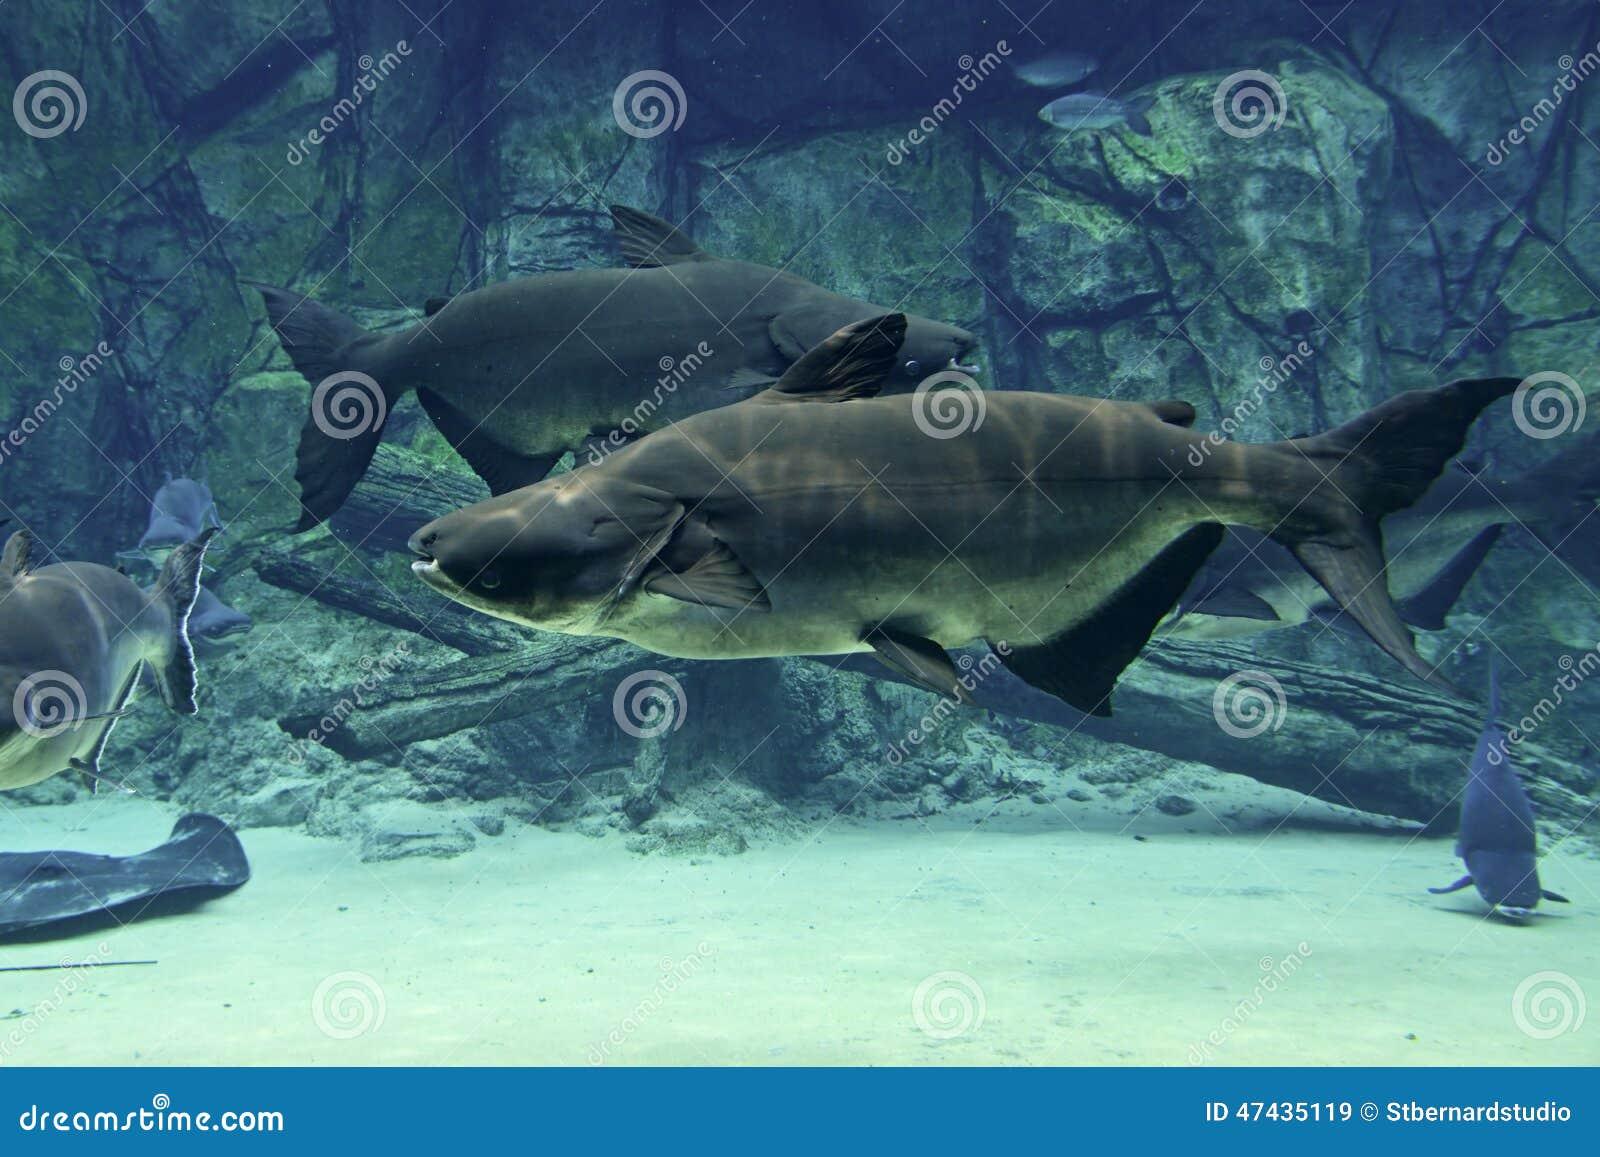 Um par de peixe-gato gigante de Mekong que nada firmemente no sentido oposto